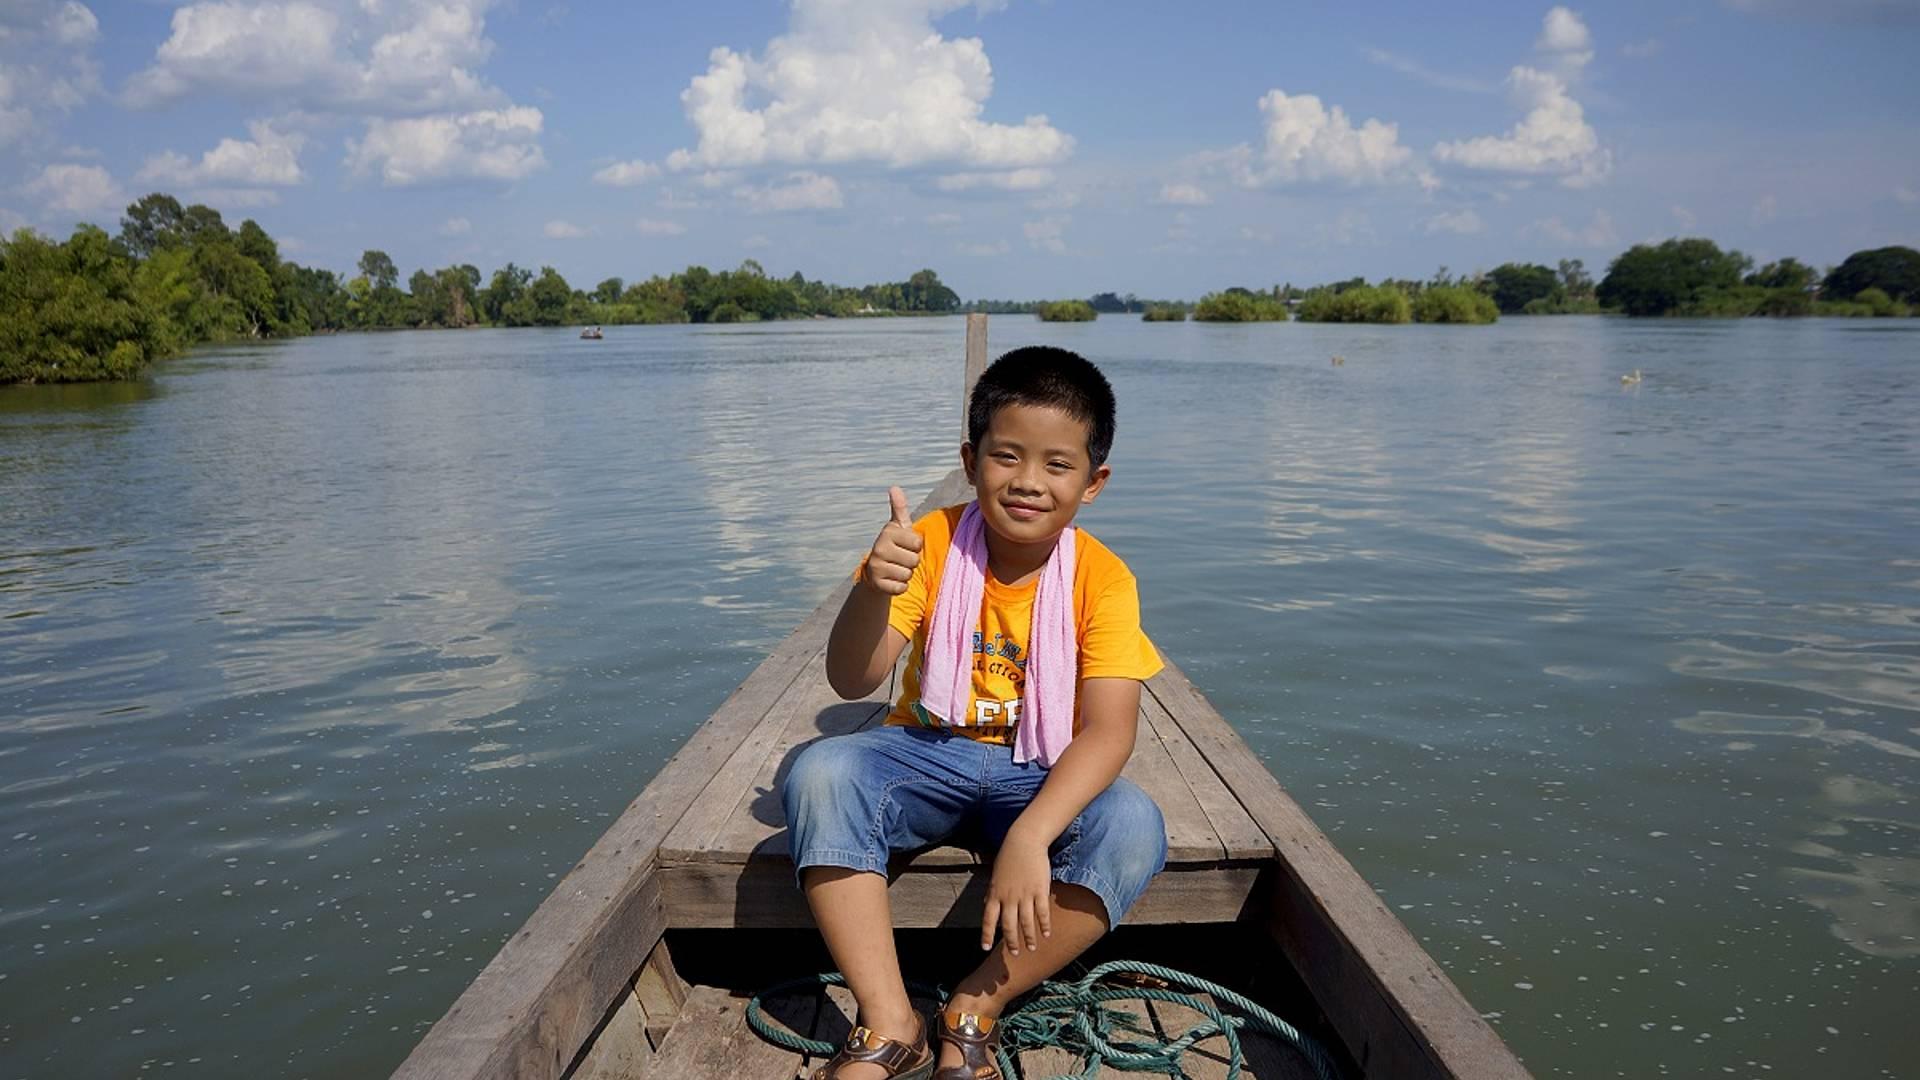 Laos - Cambodge, des 4000 îles aux temples d'Angkor